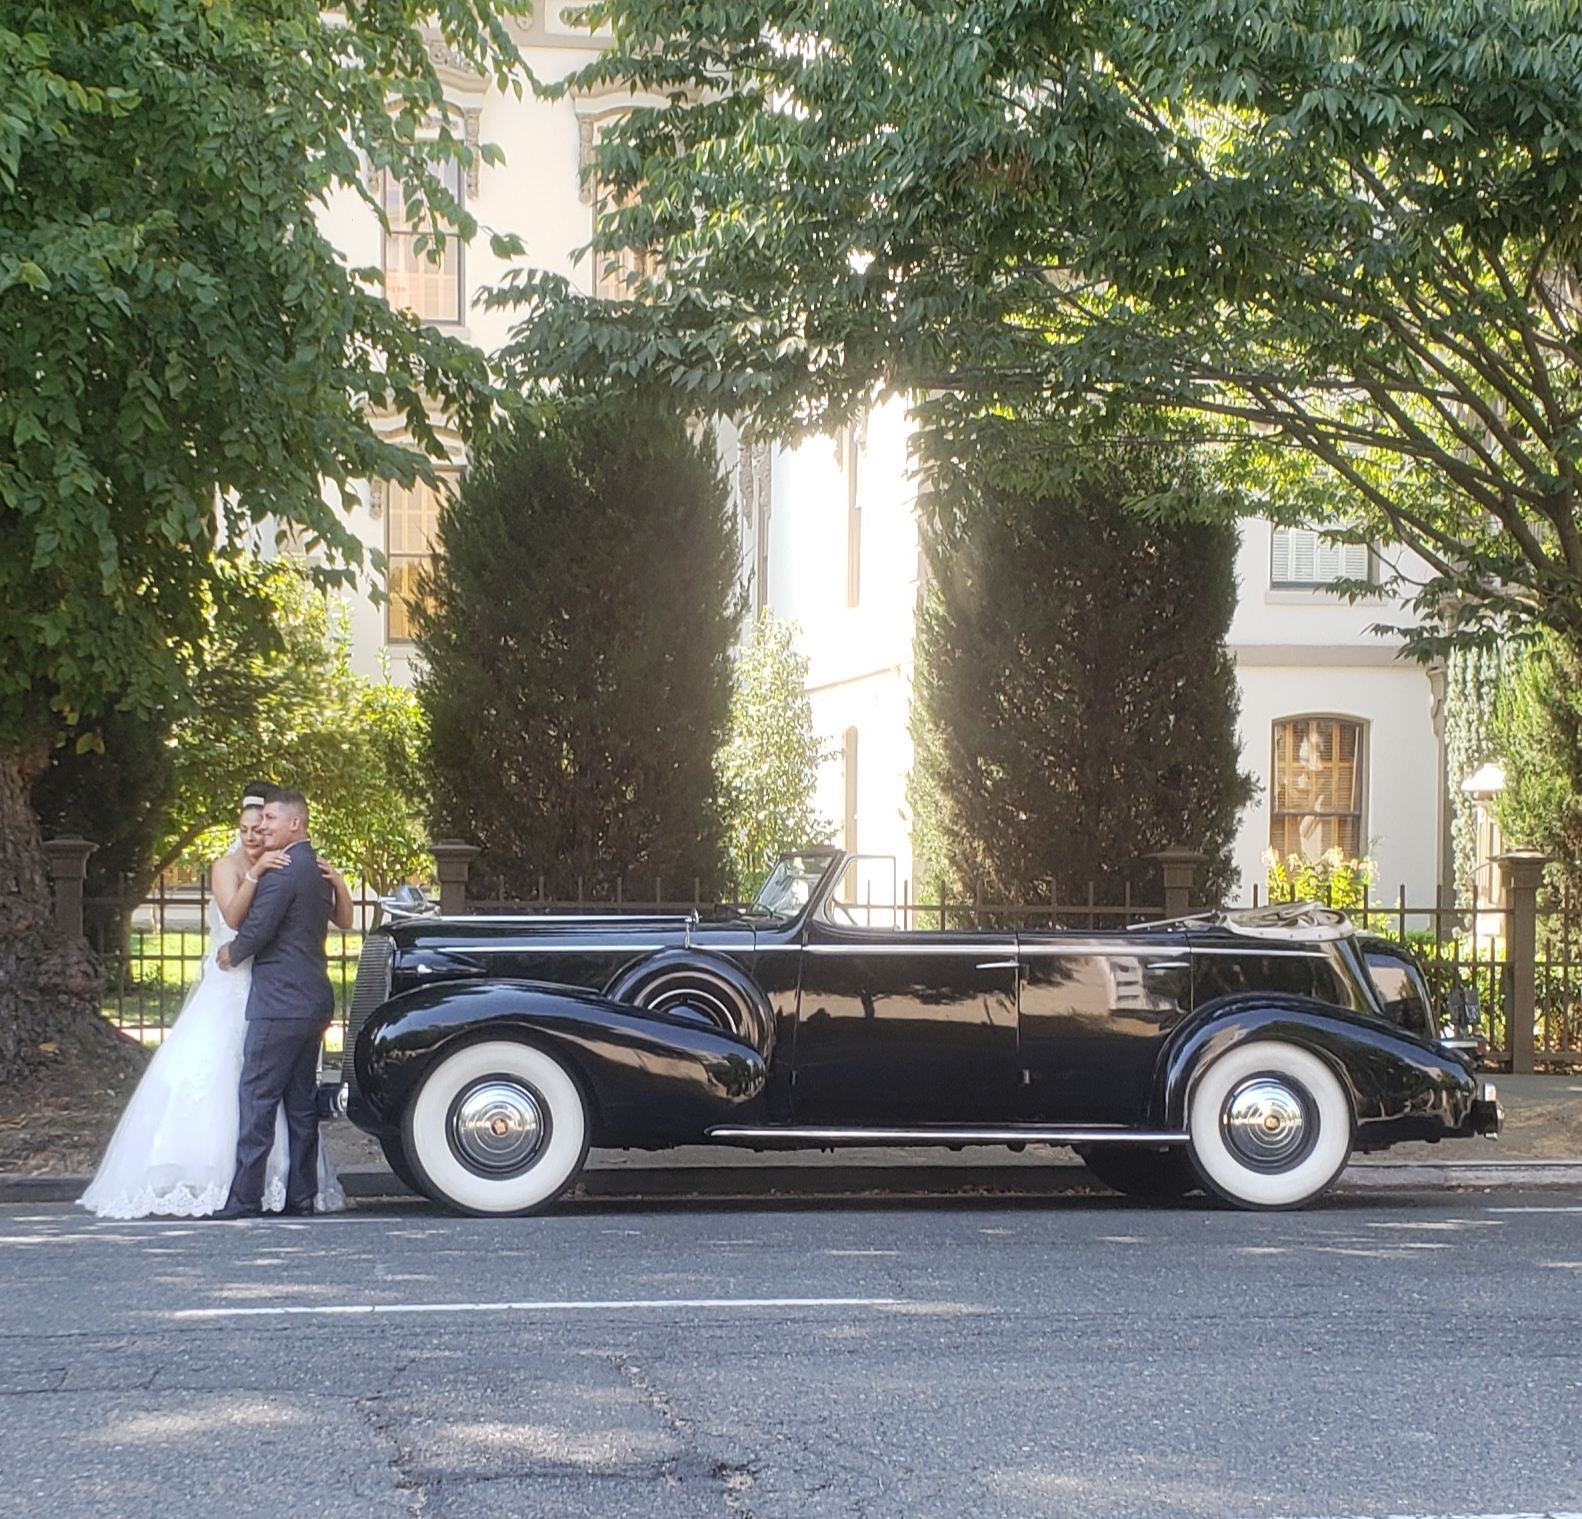 1937 Cadillac Fleetwood Phaeton